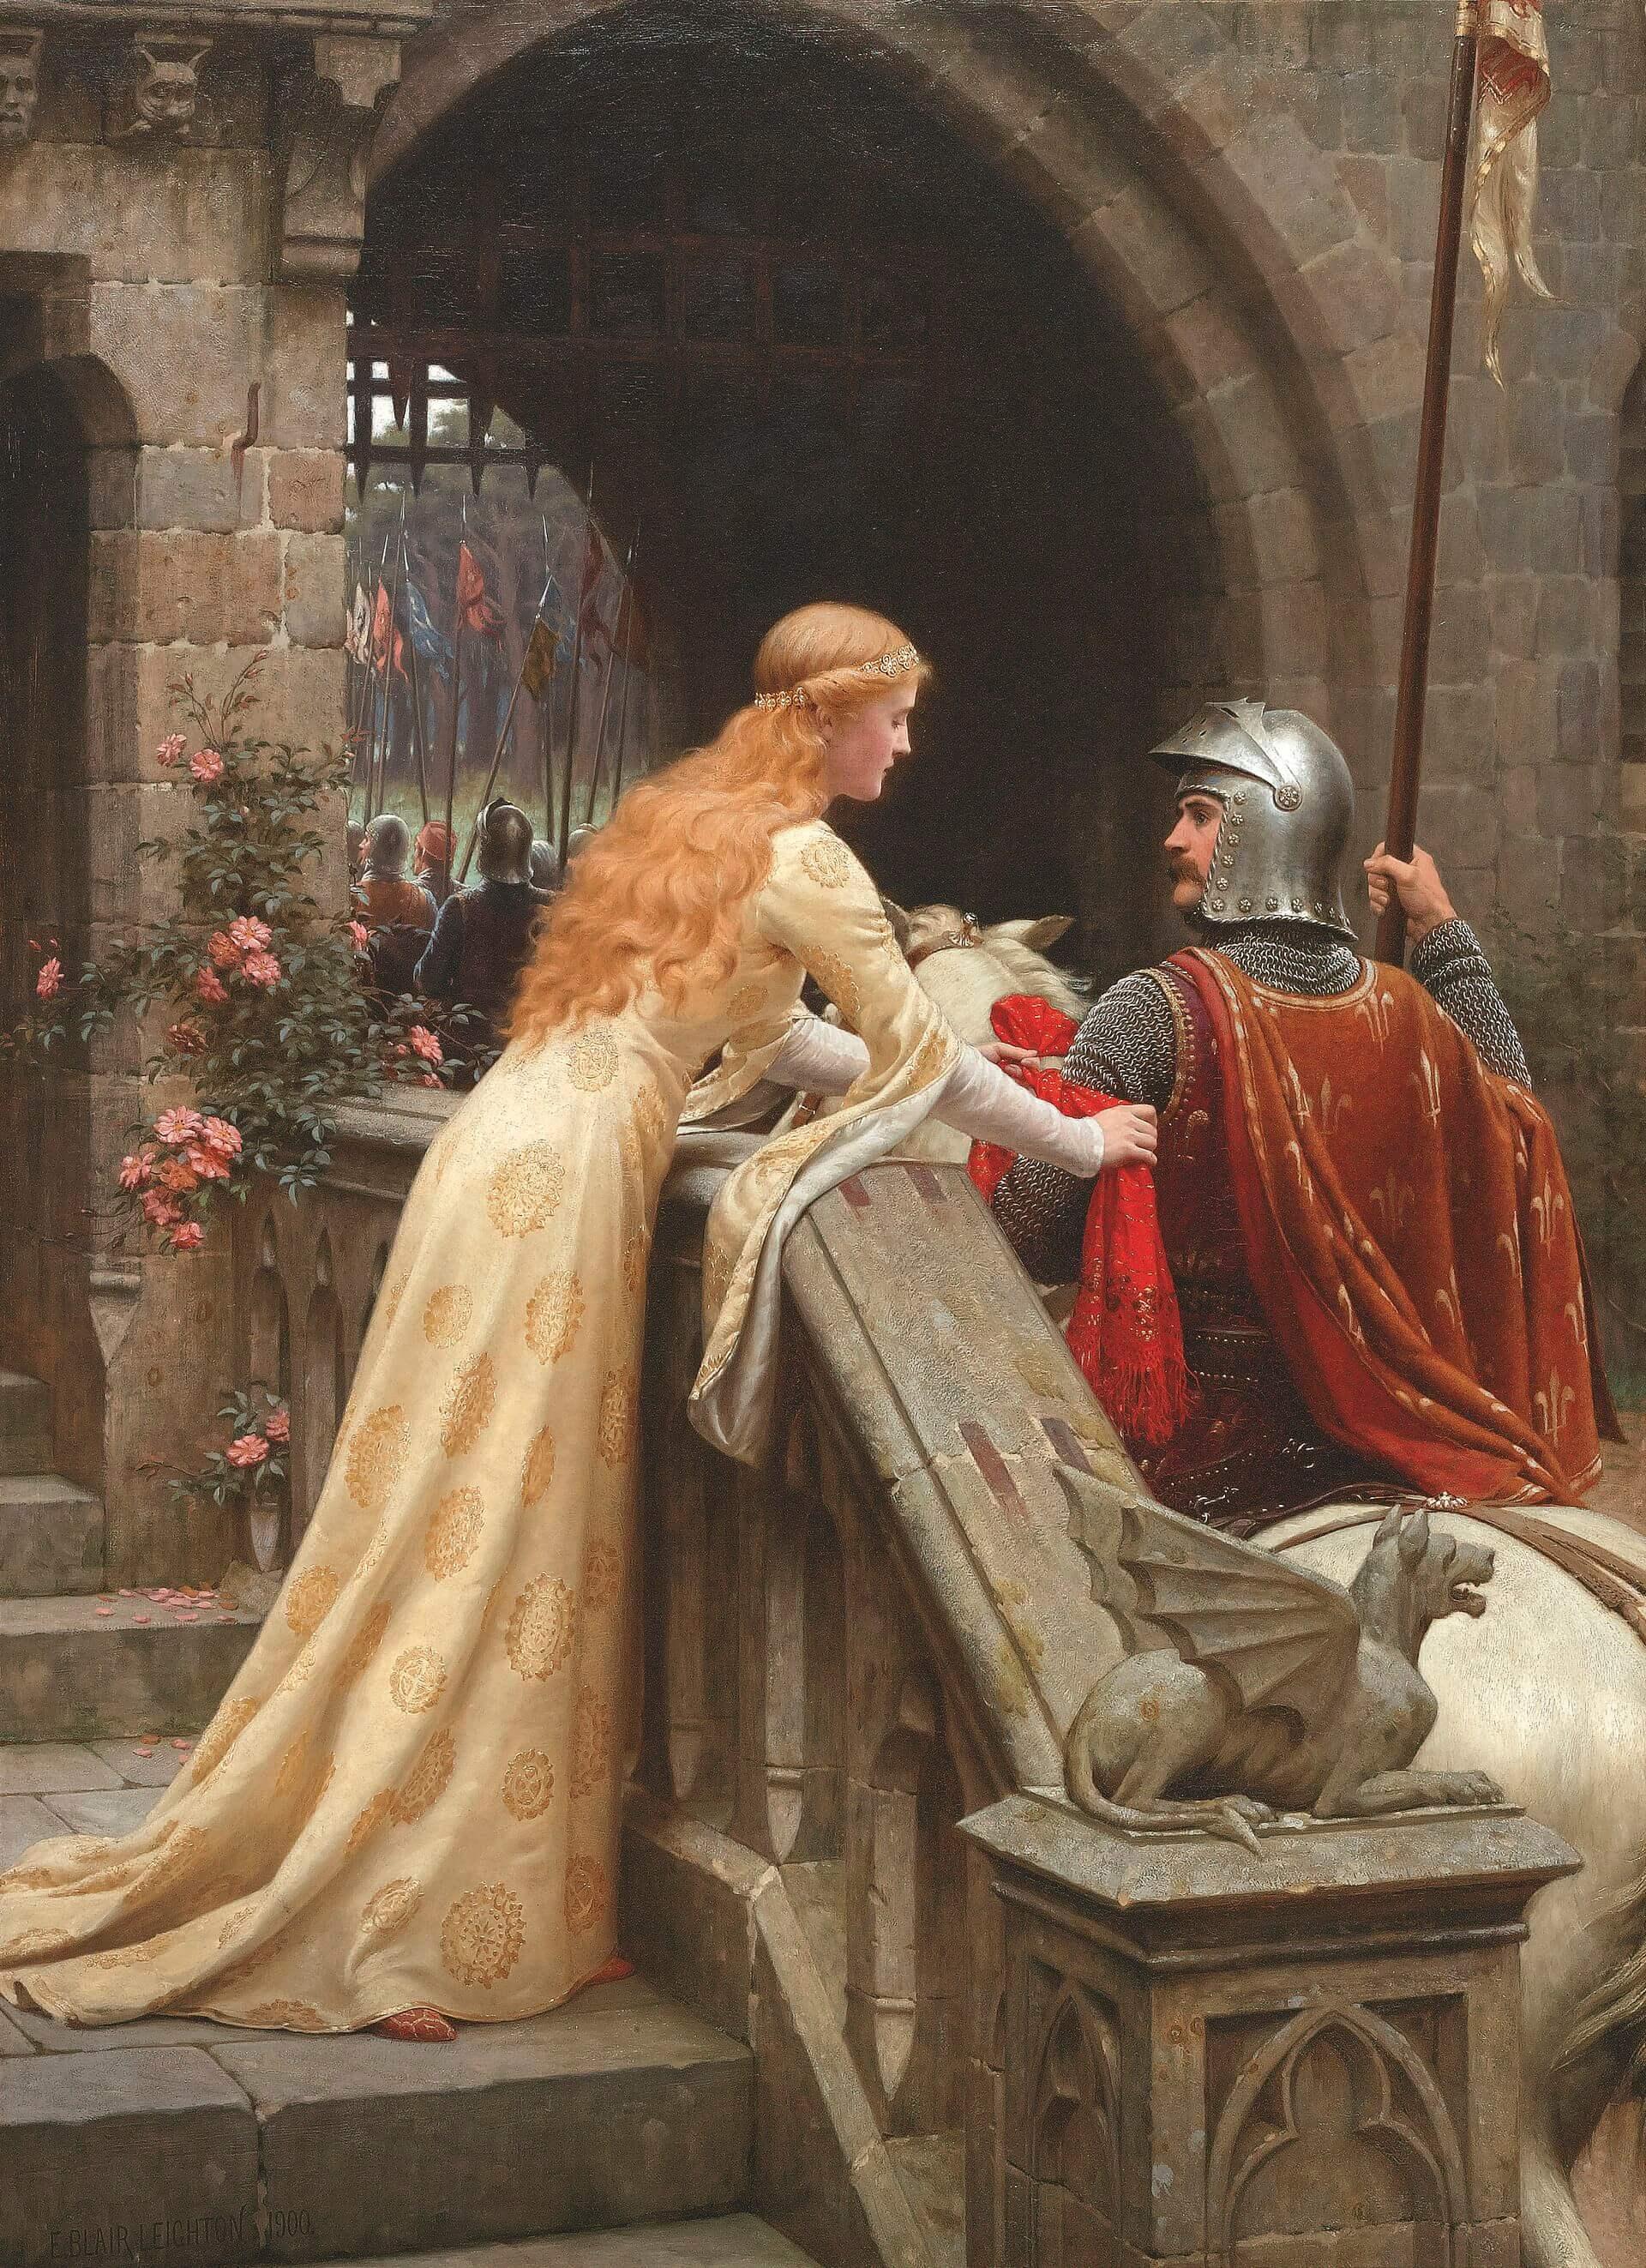 Sansa Stark ideales caballería